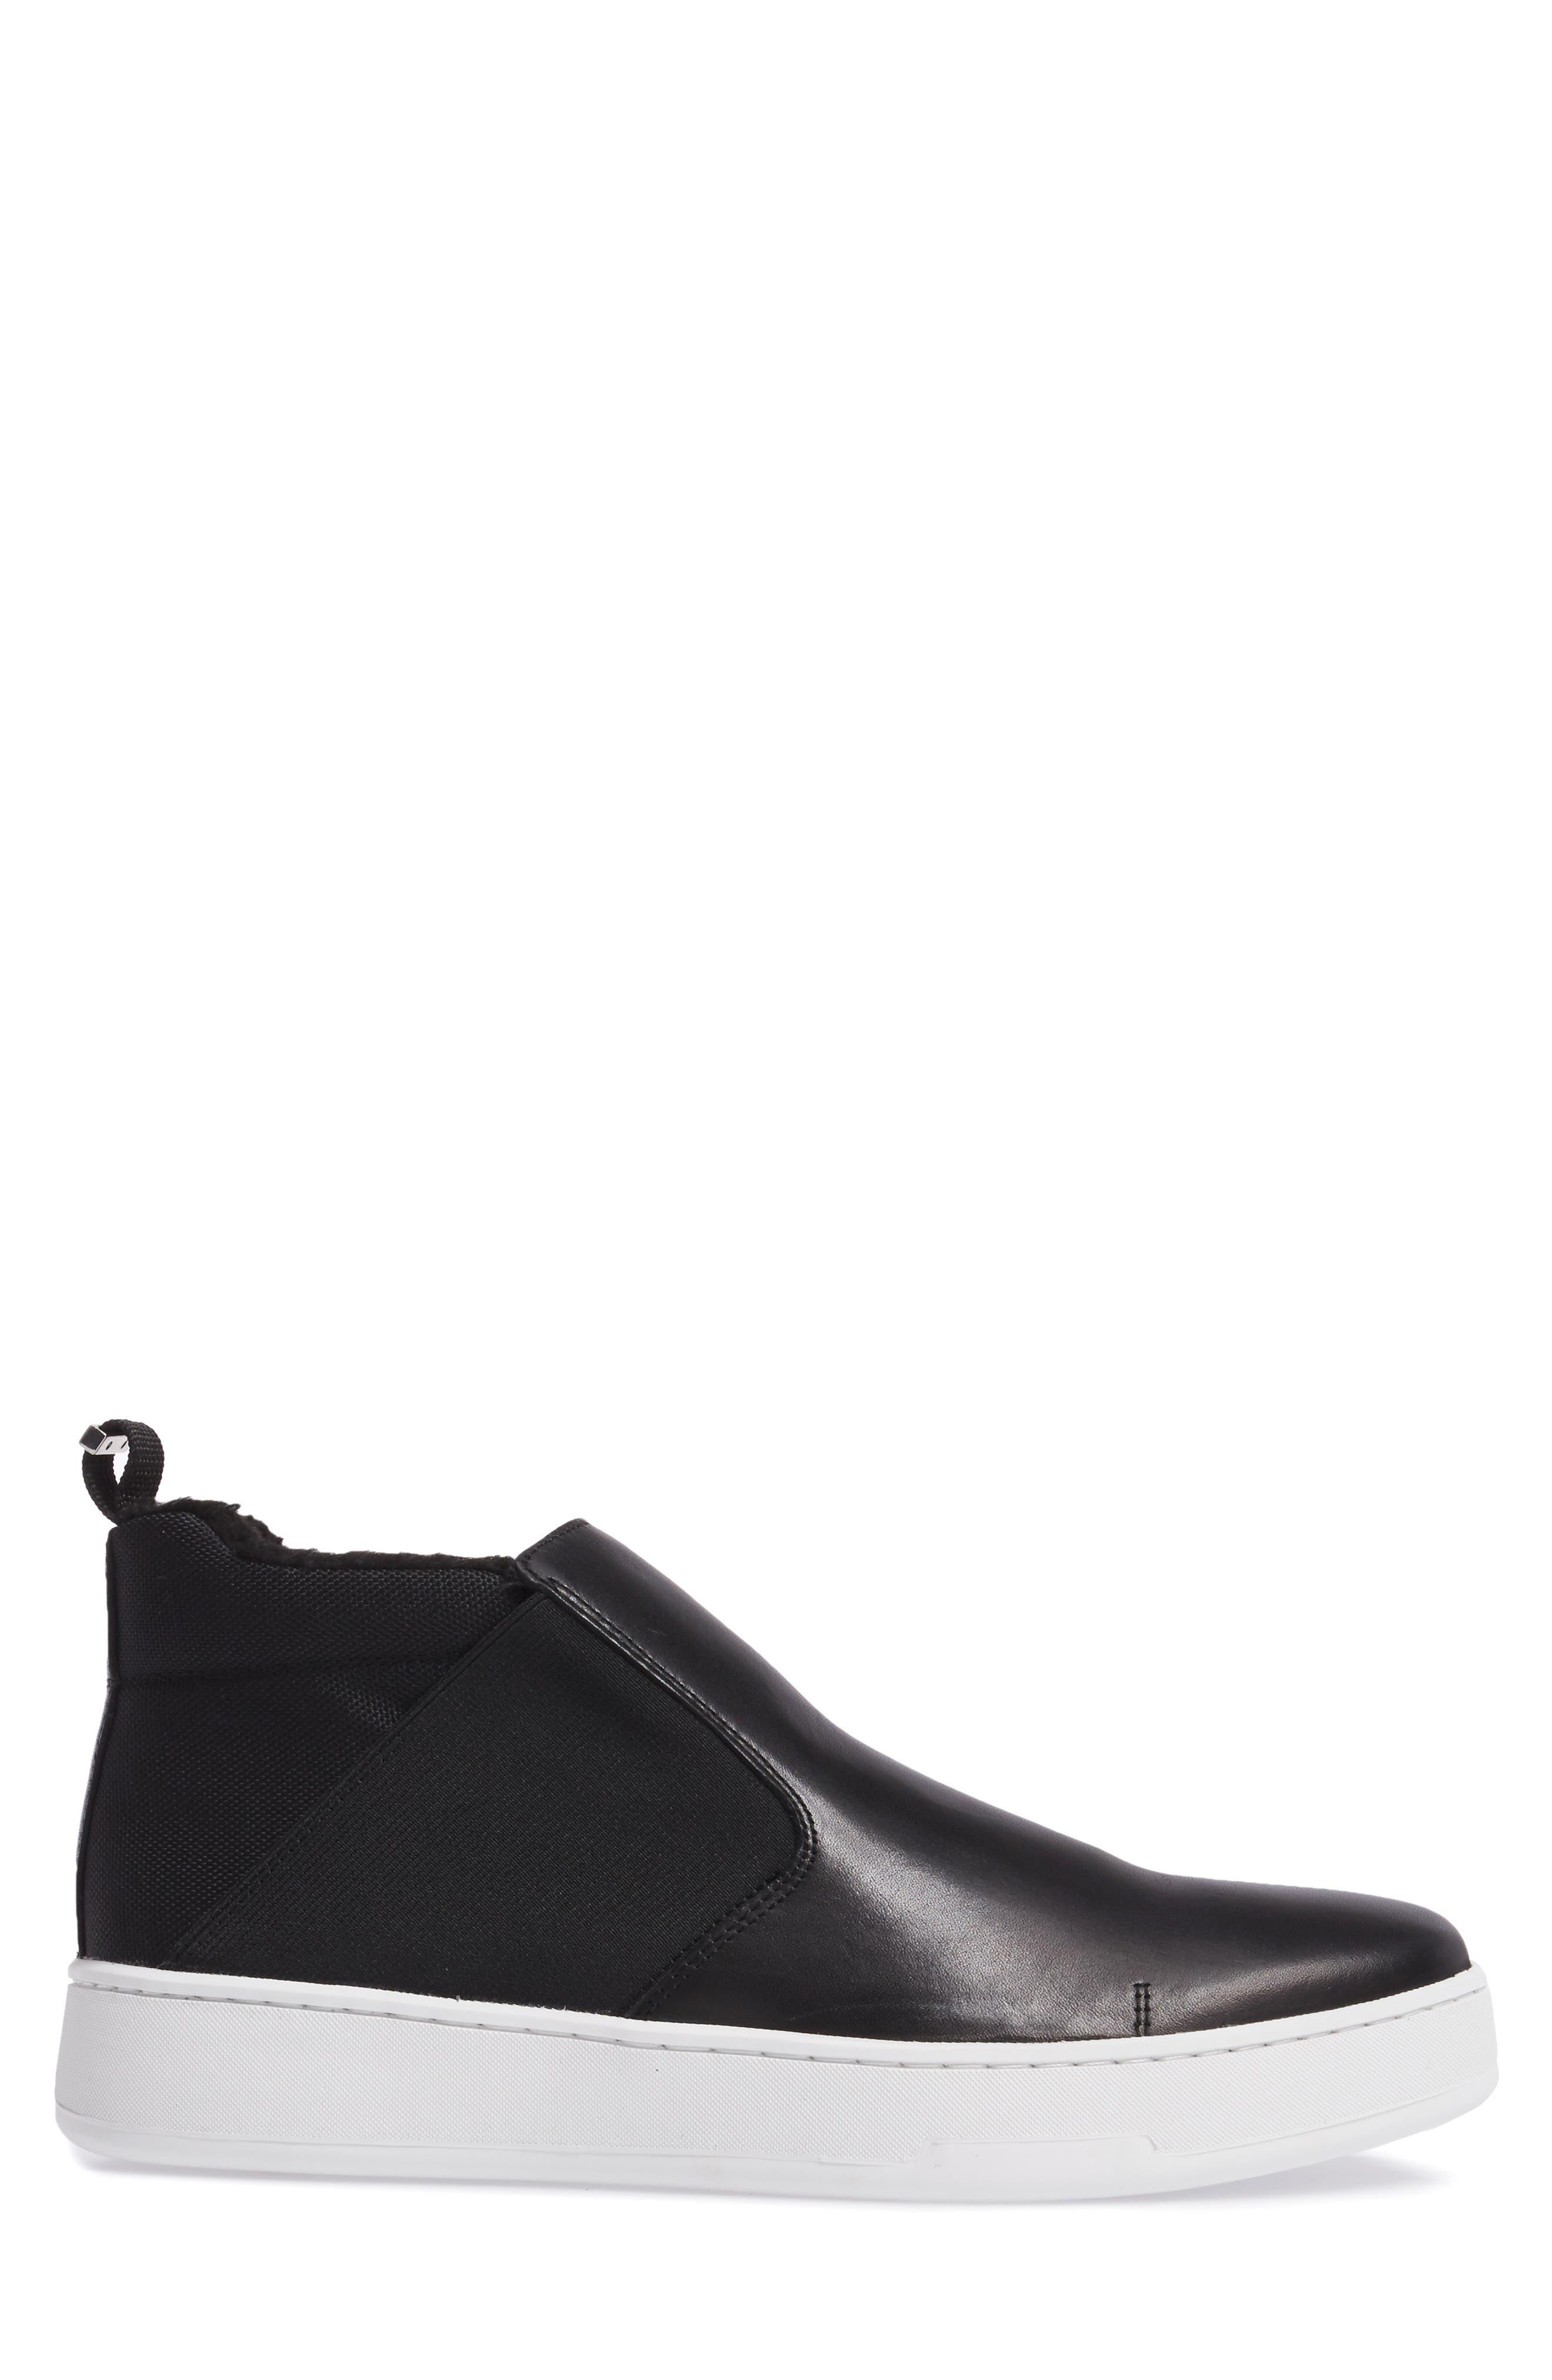 Noble Slip-On,                             Alternate thumbnail 3, color,                             Black Leather